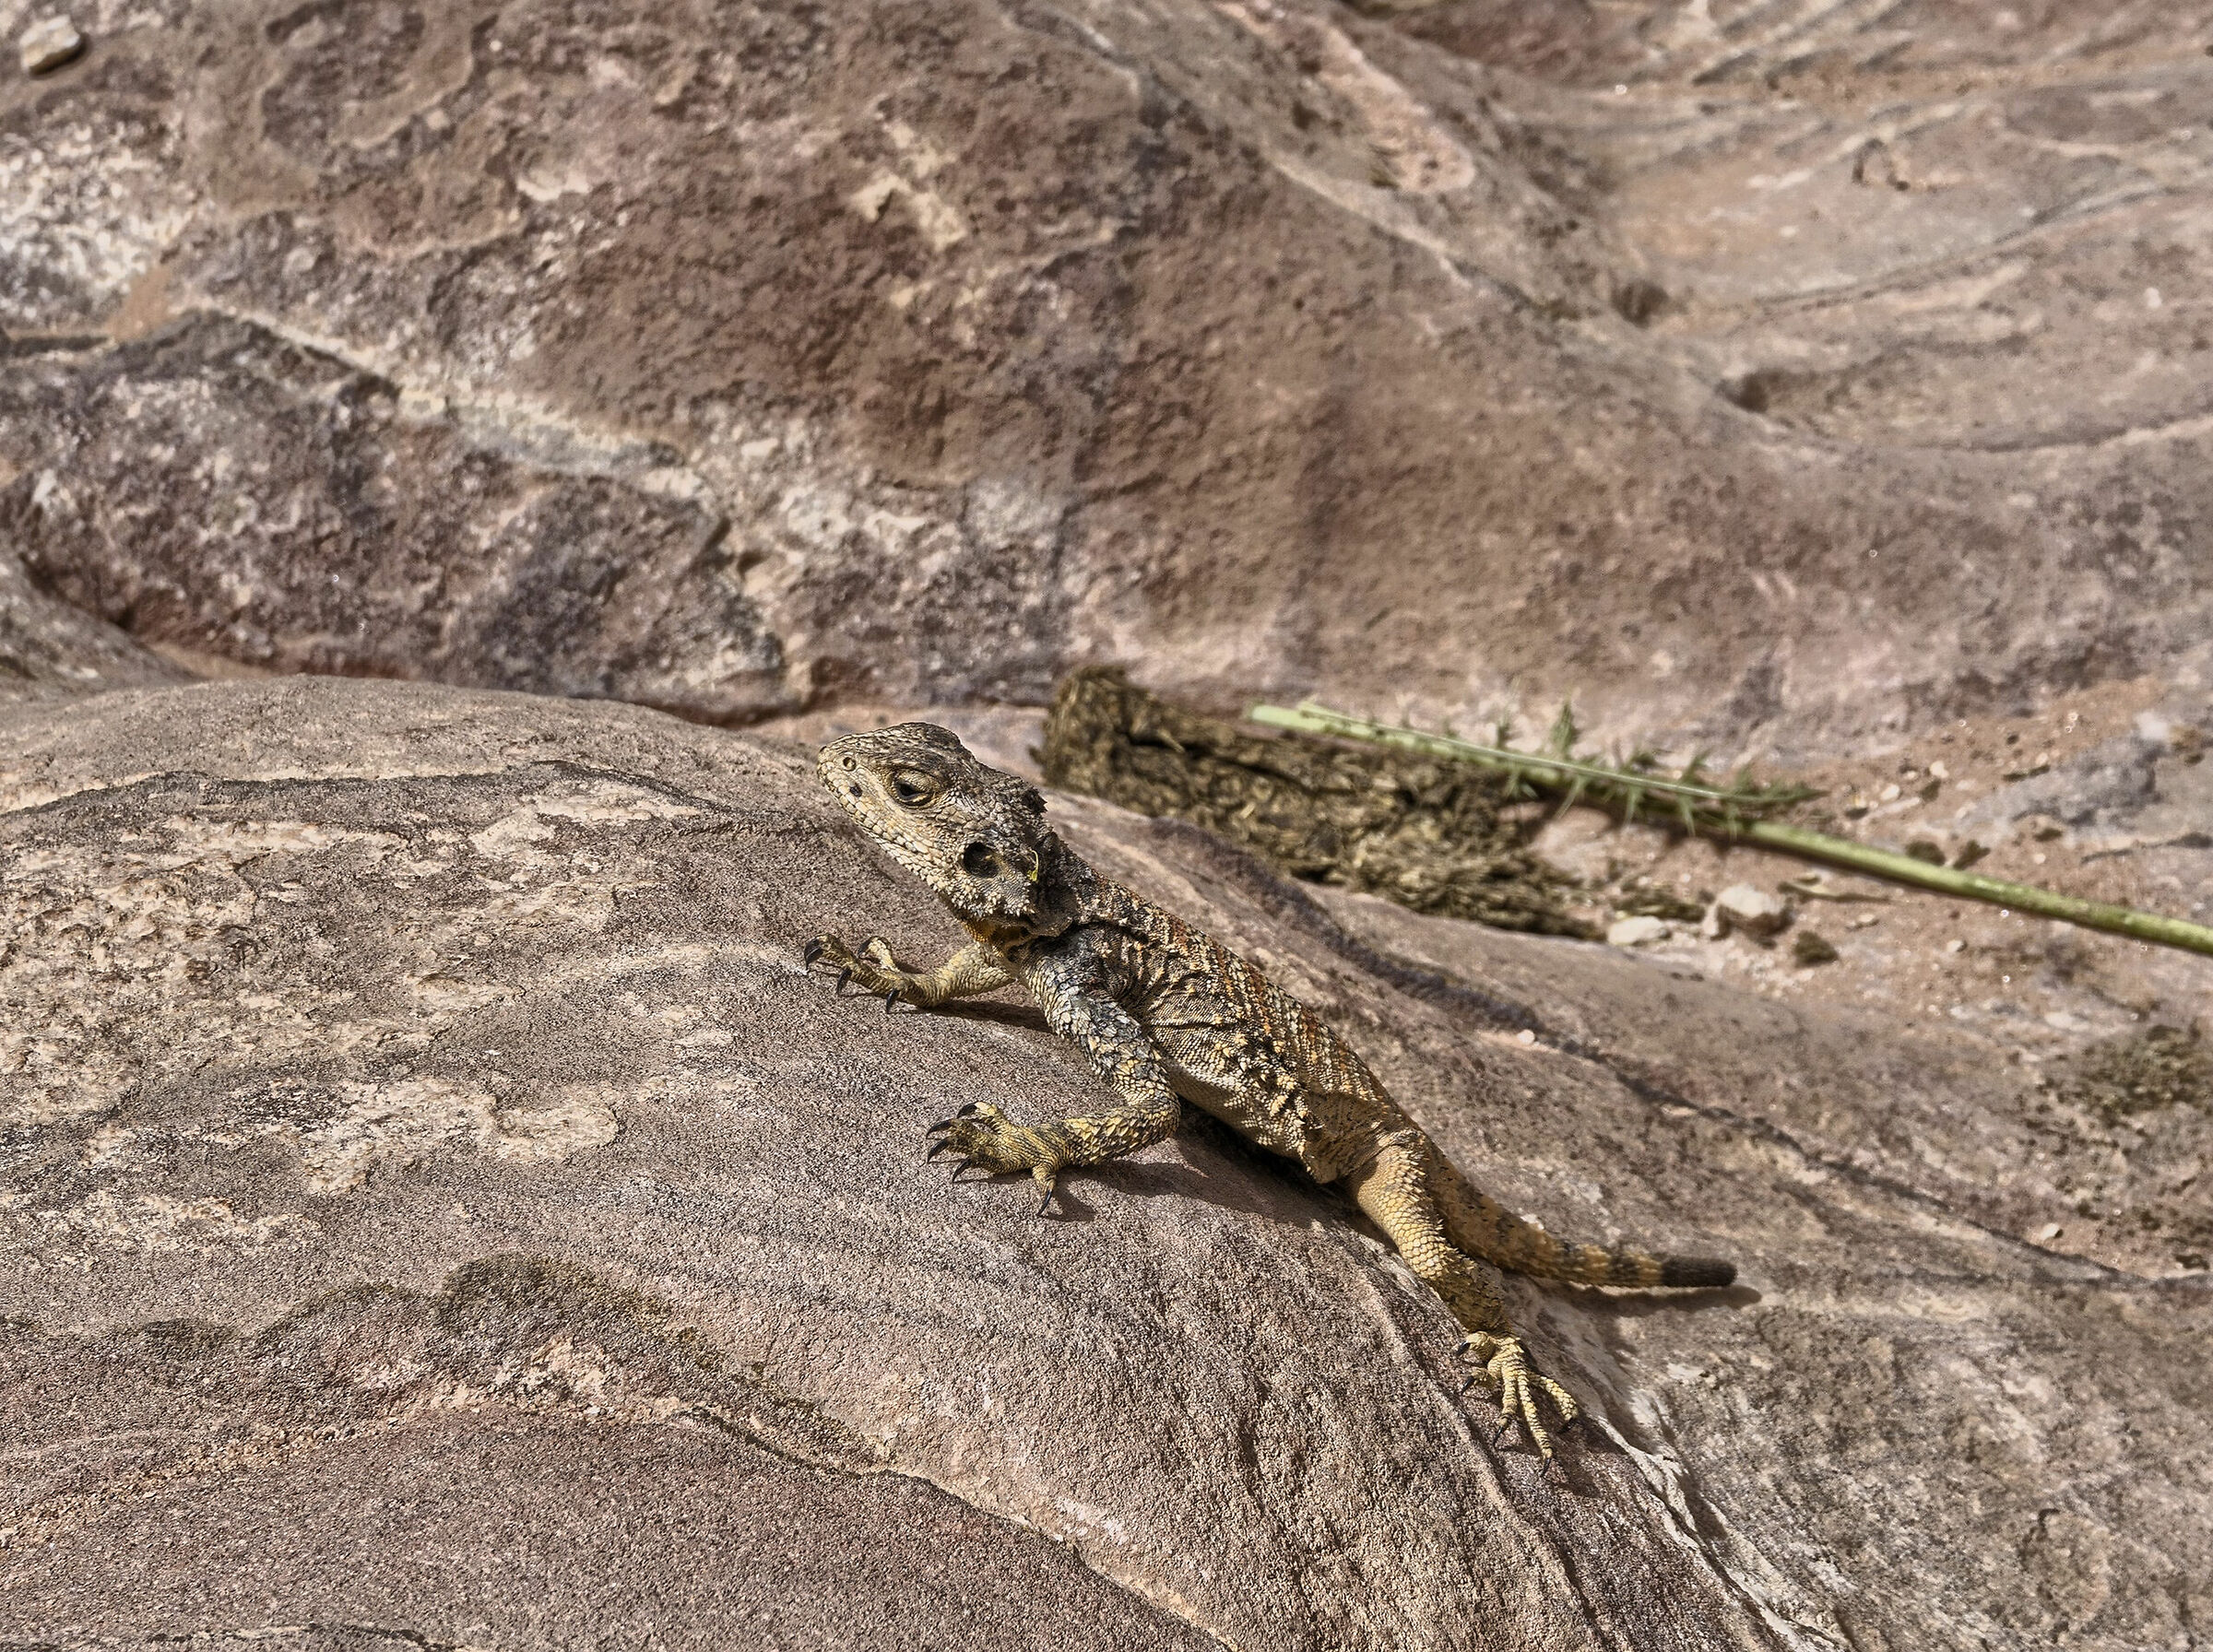 The vain reptile...